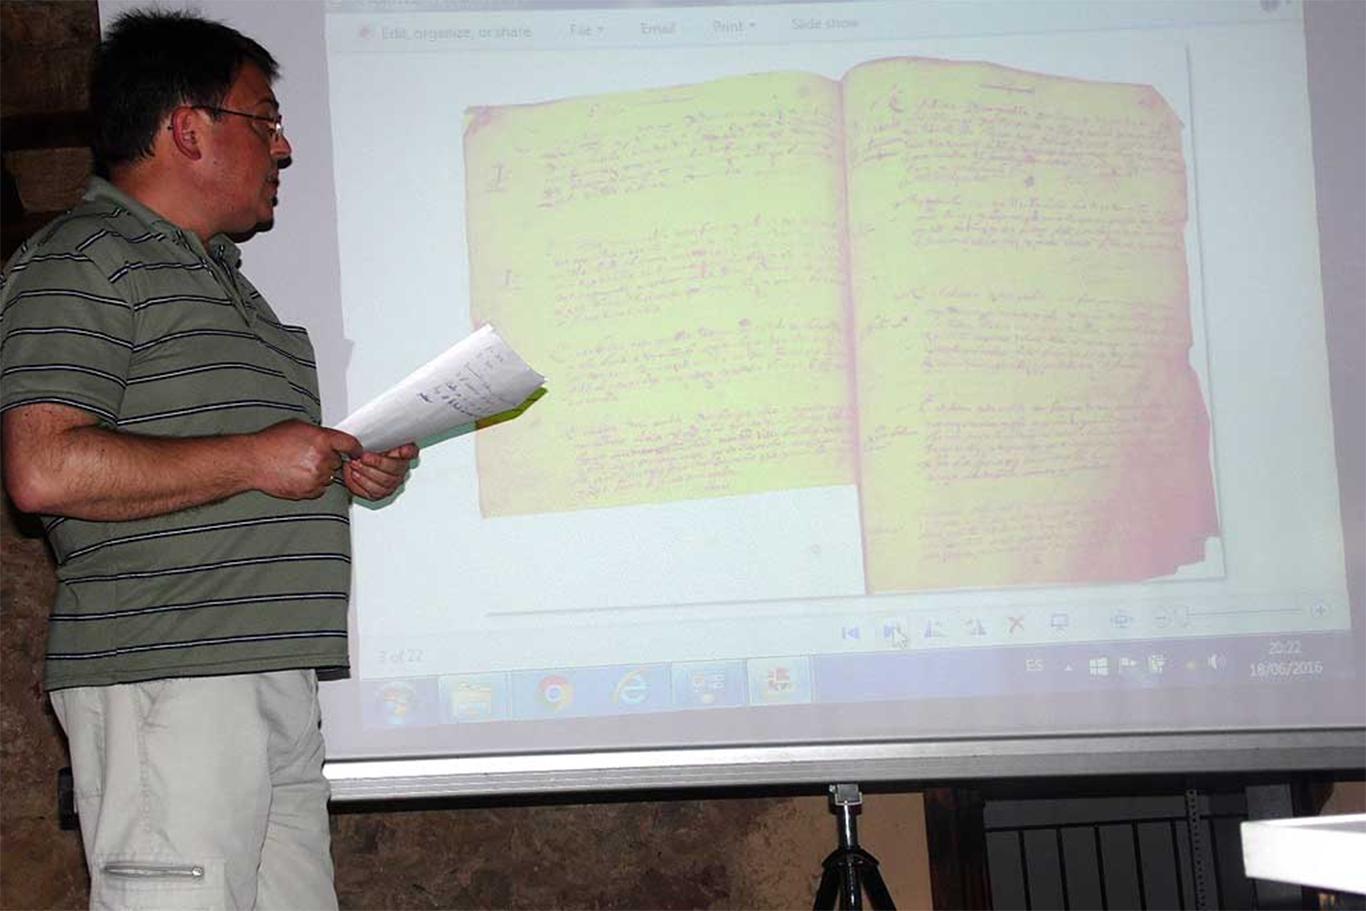 Un Autor Toledano Publica Que Cervantes Nació En Alcázar De San Juan Dream Alcalá